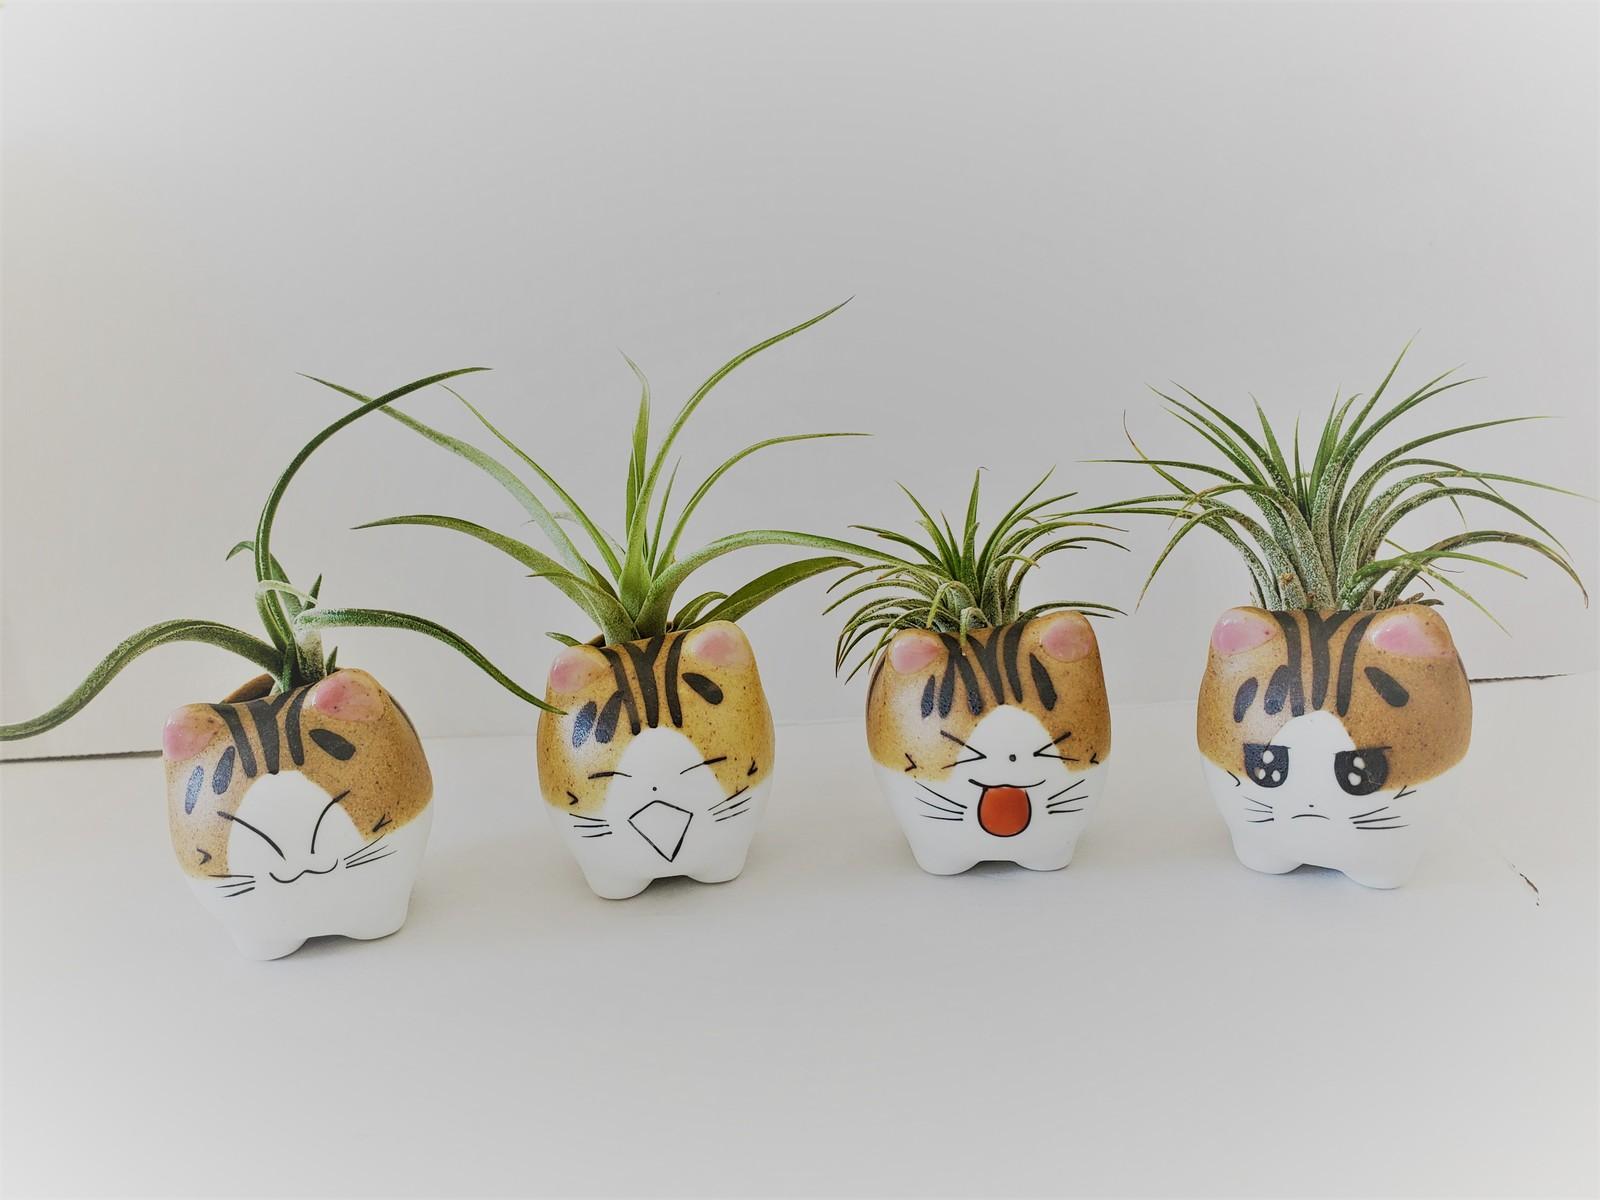 Catplanters airplant 1